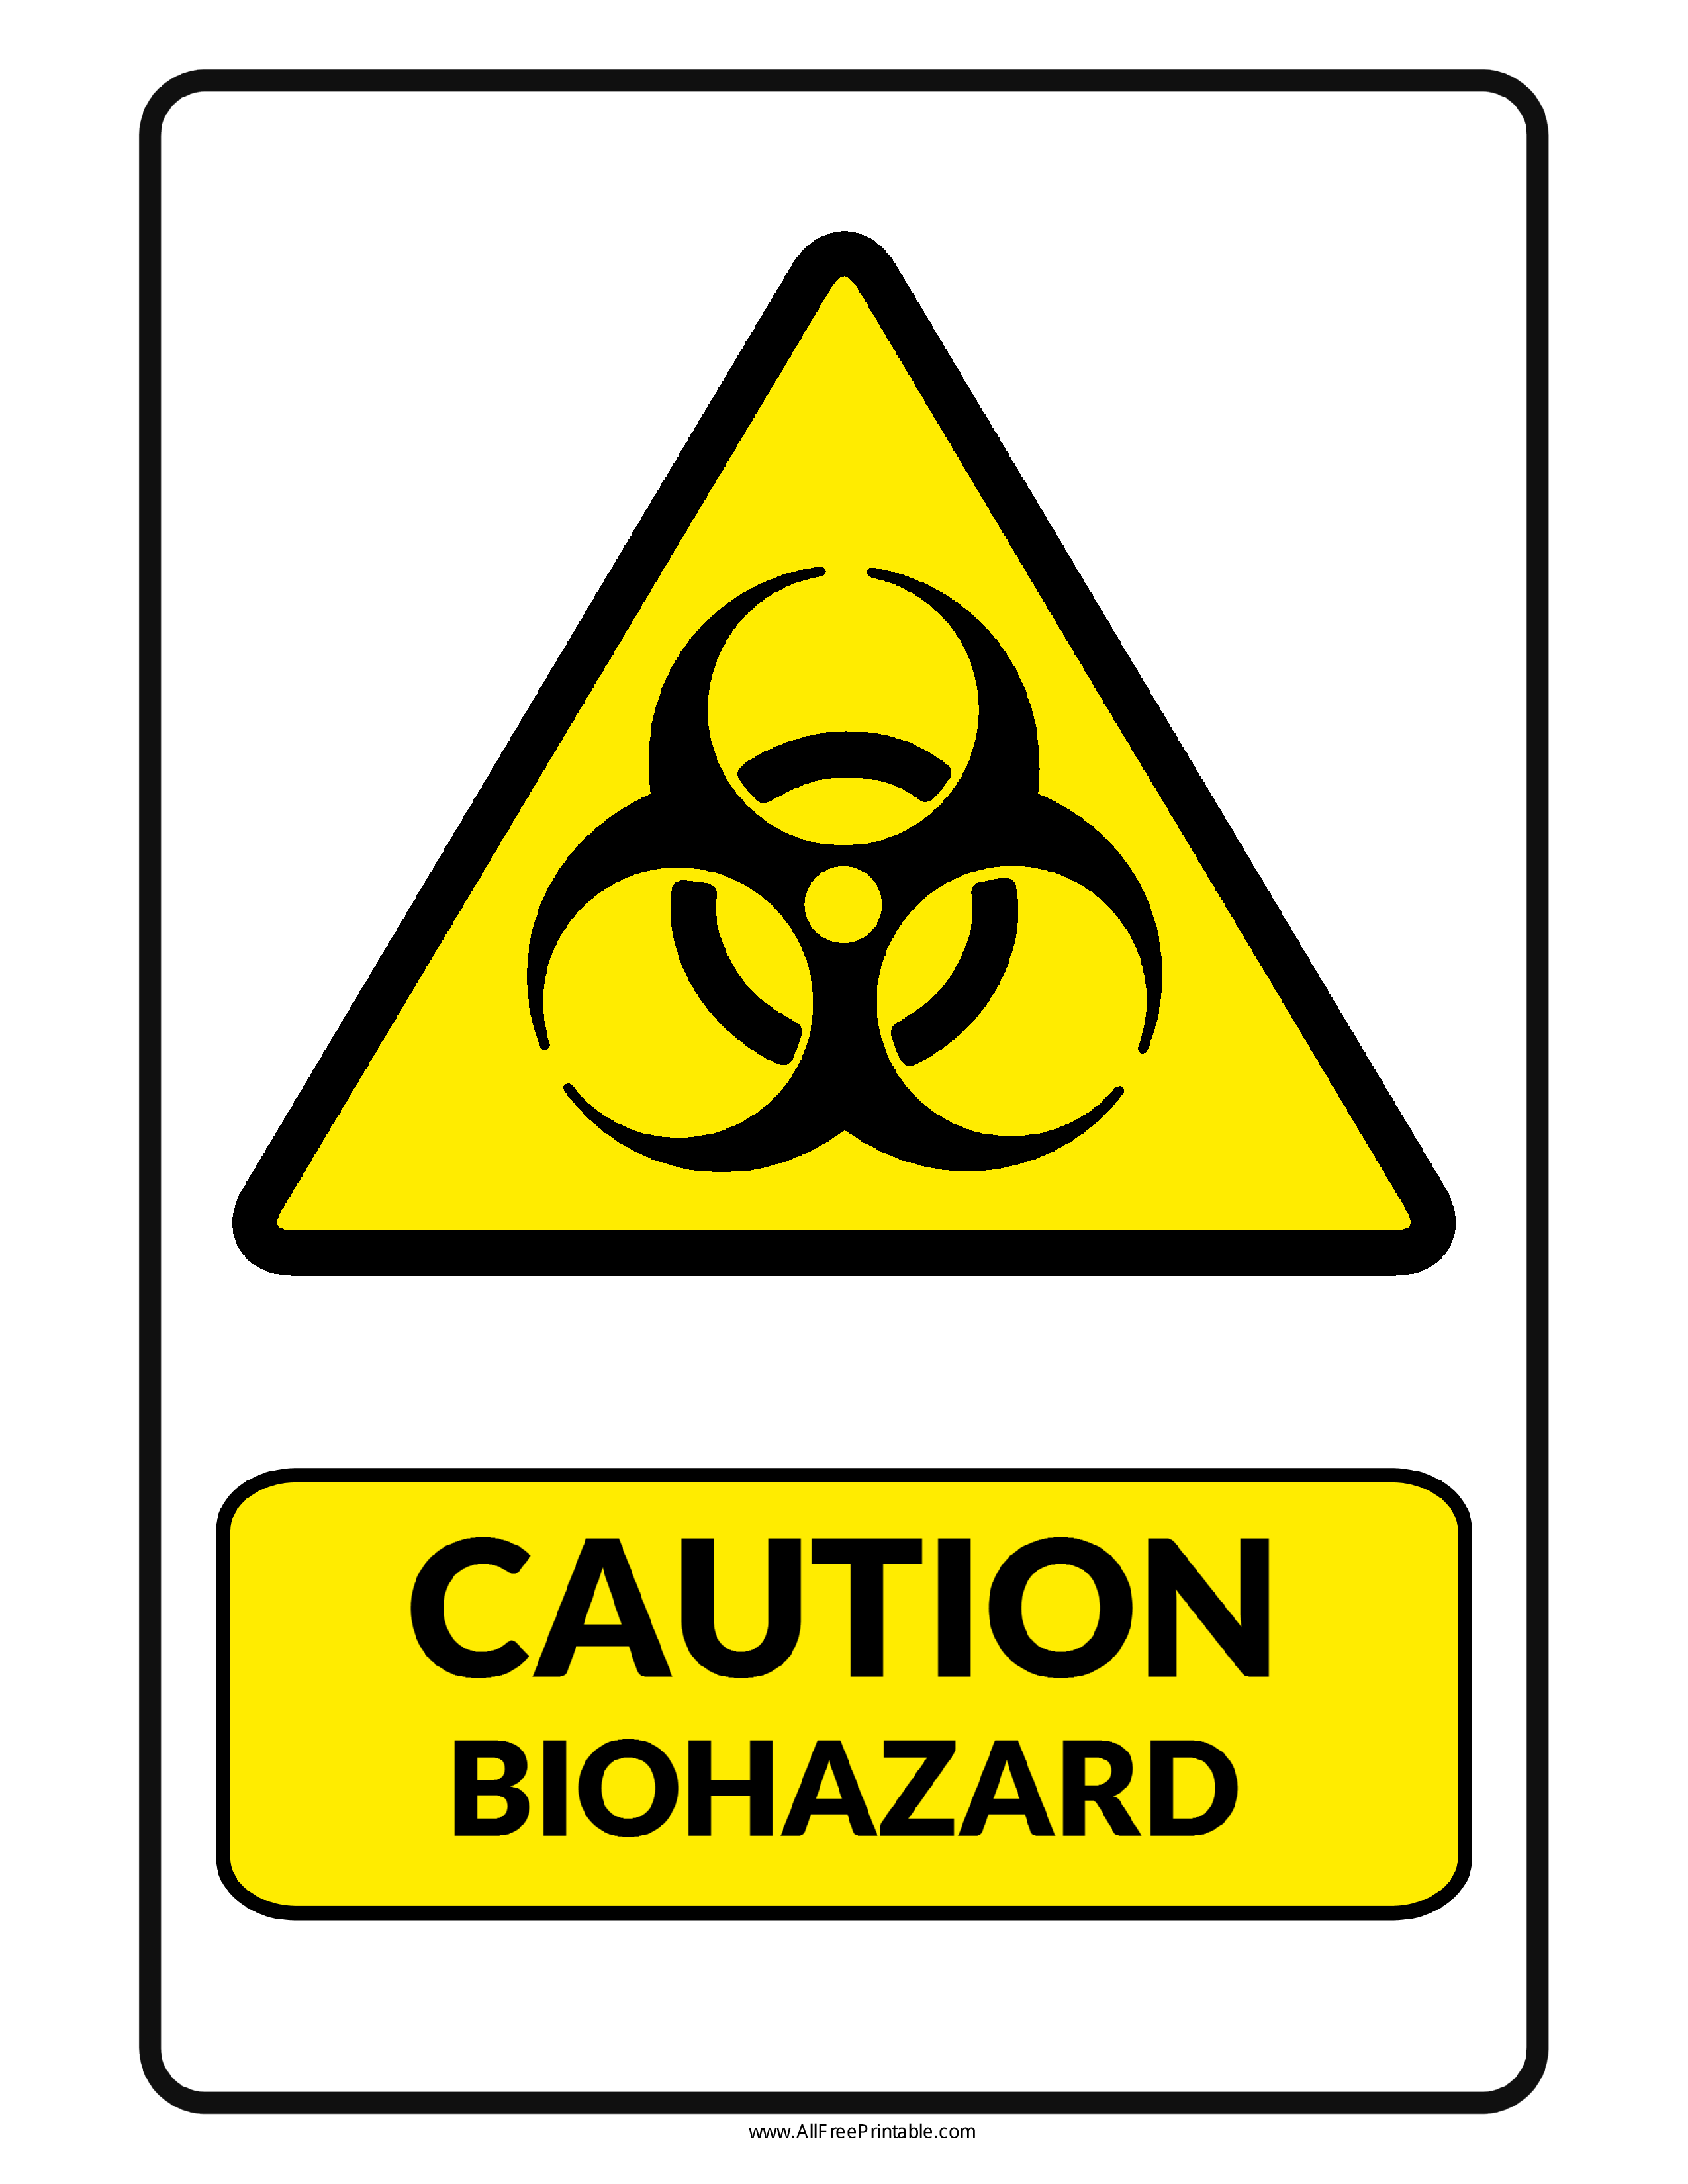 bio hazard sign looking for a bio hazard sign sign download this